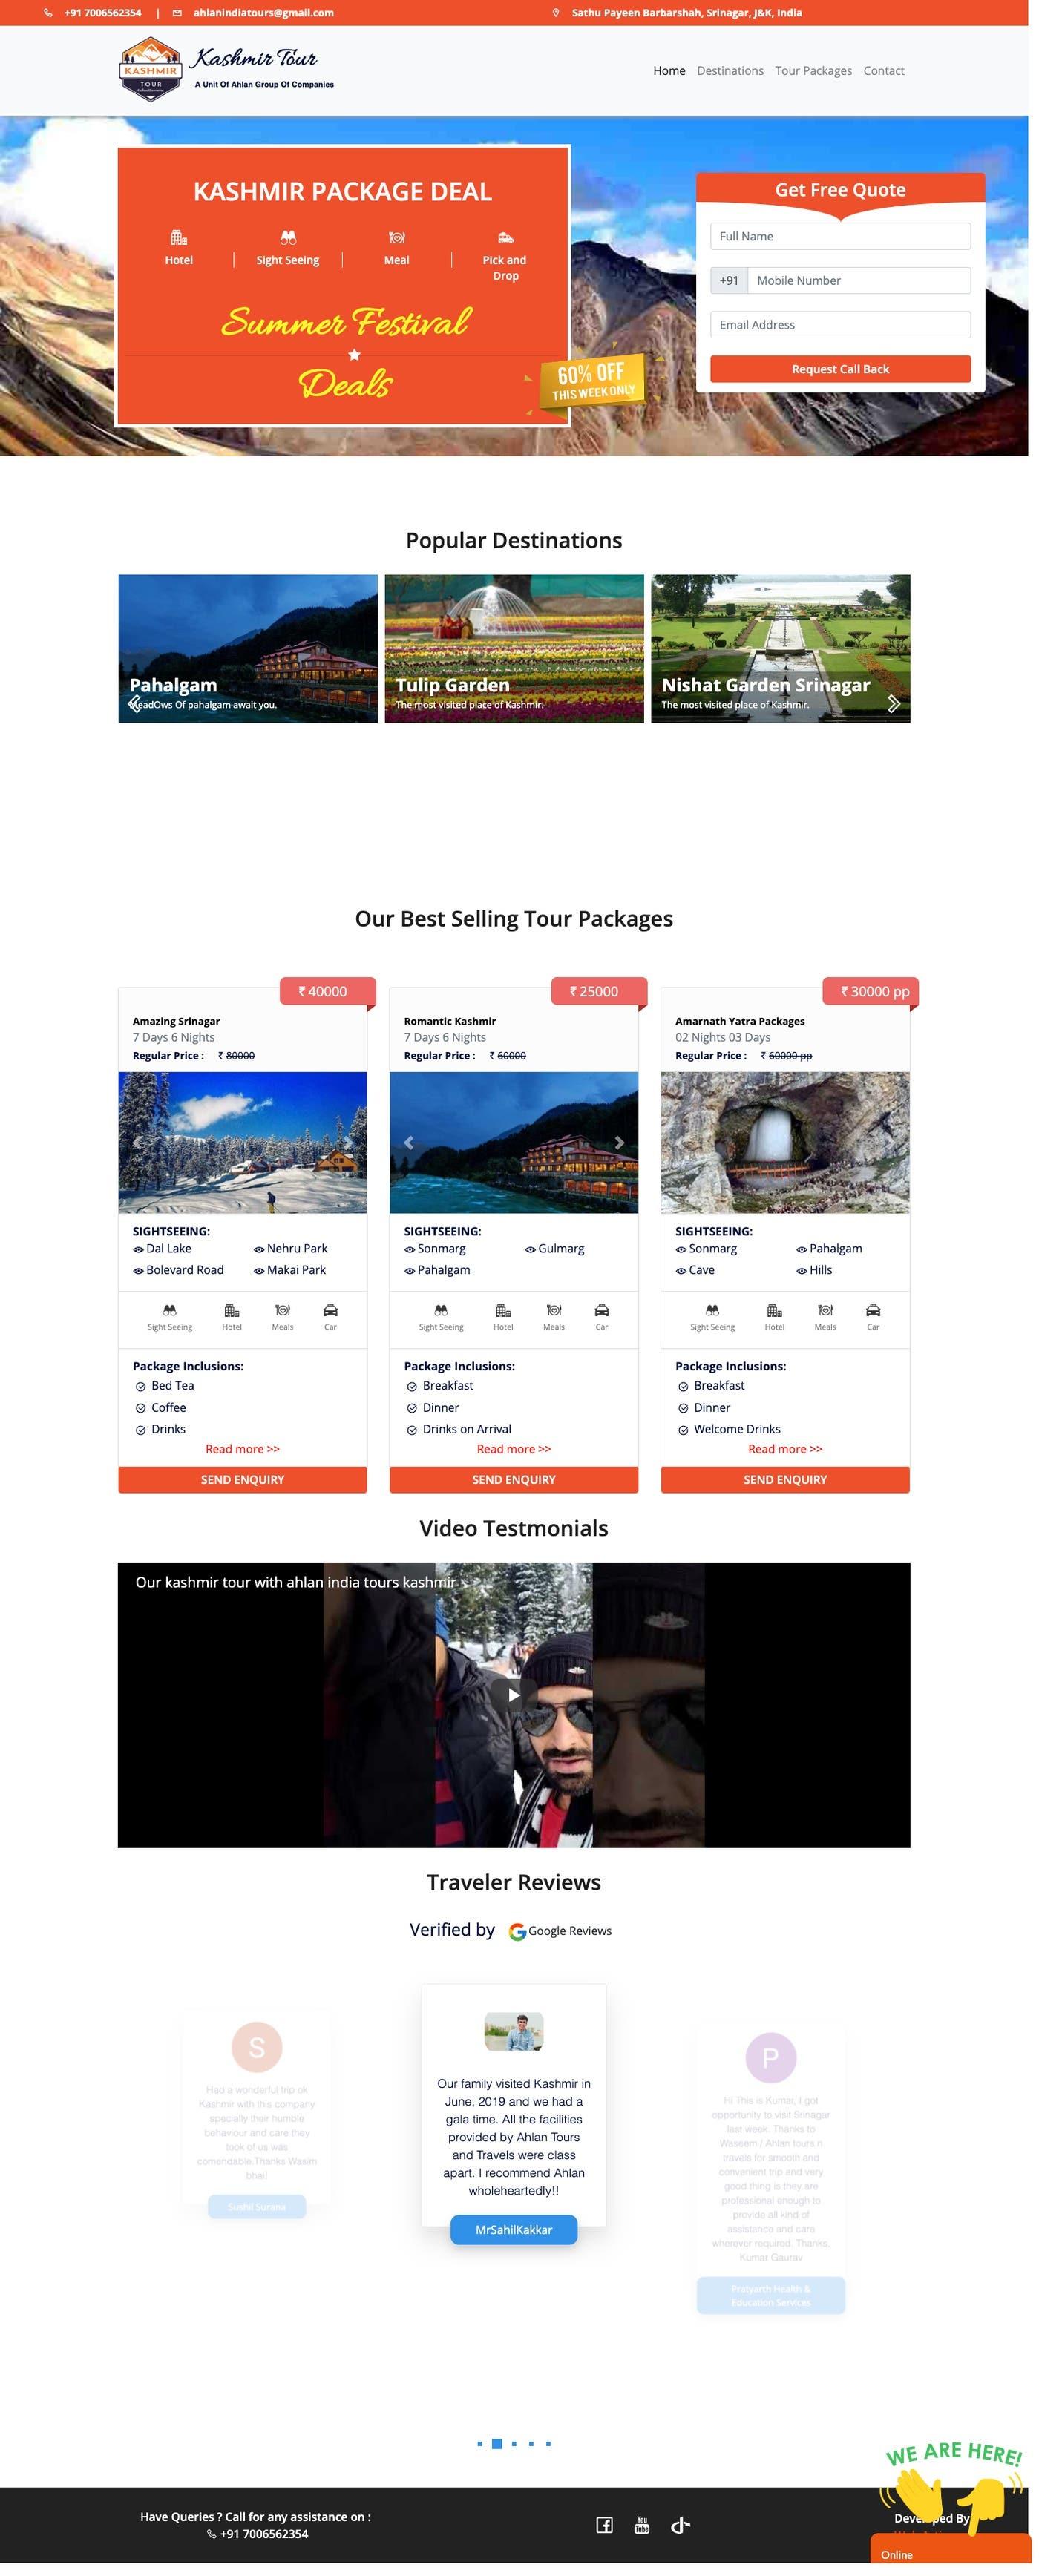 screencapture-kashmirtour-in-2019-07-04-09_52_08.png